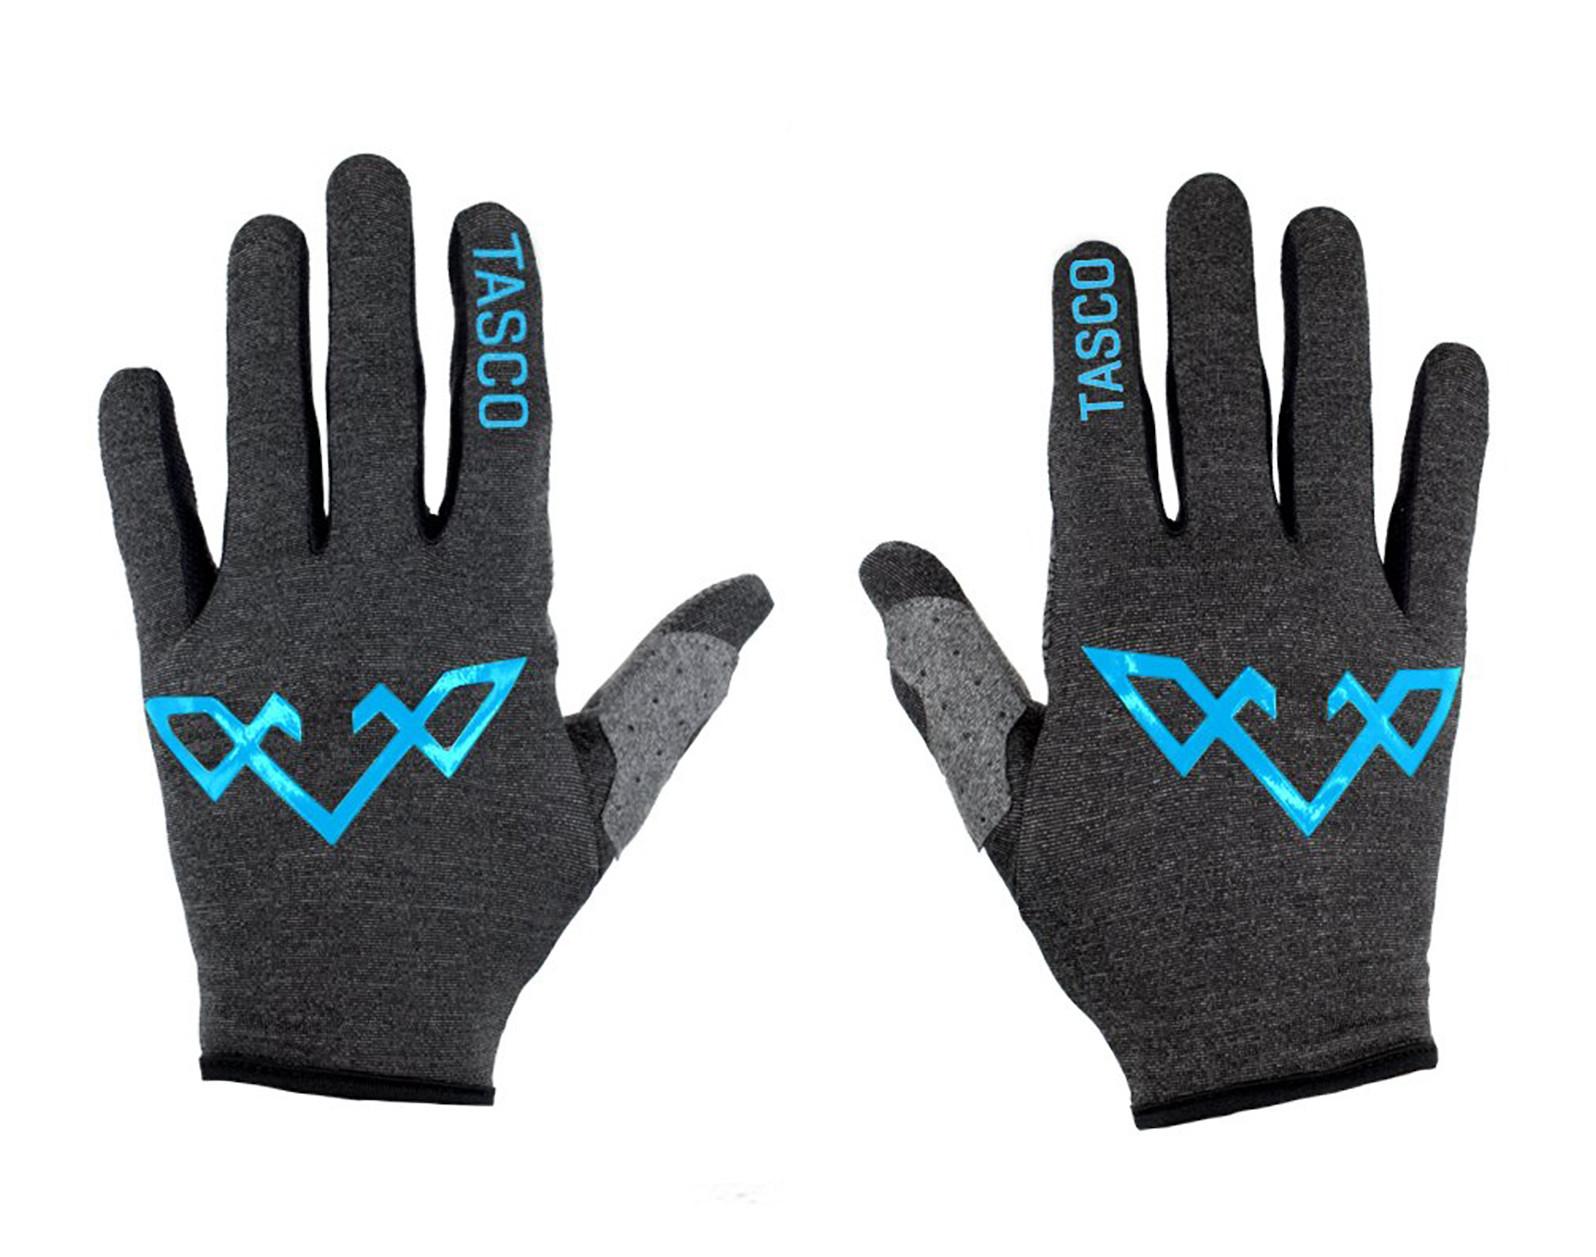 RECON Ultralight Cycling Gloves - Cyan Pop